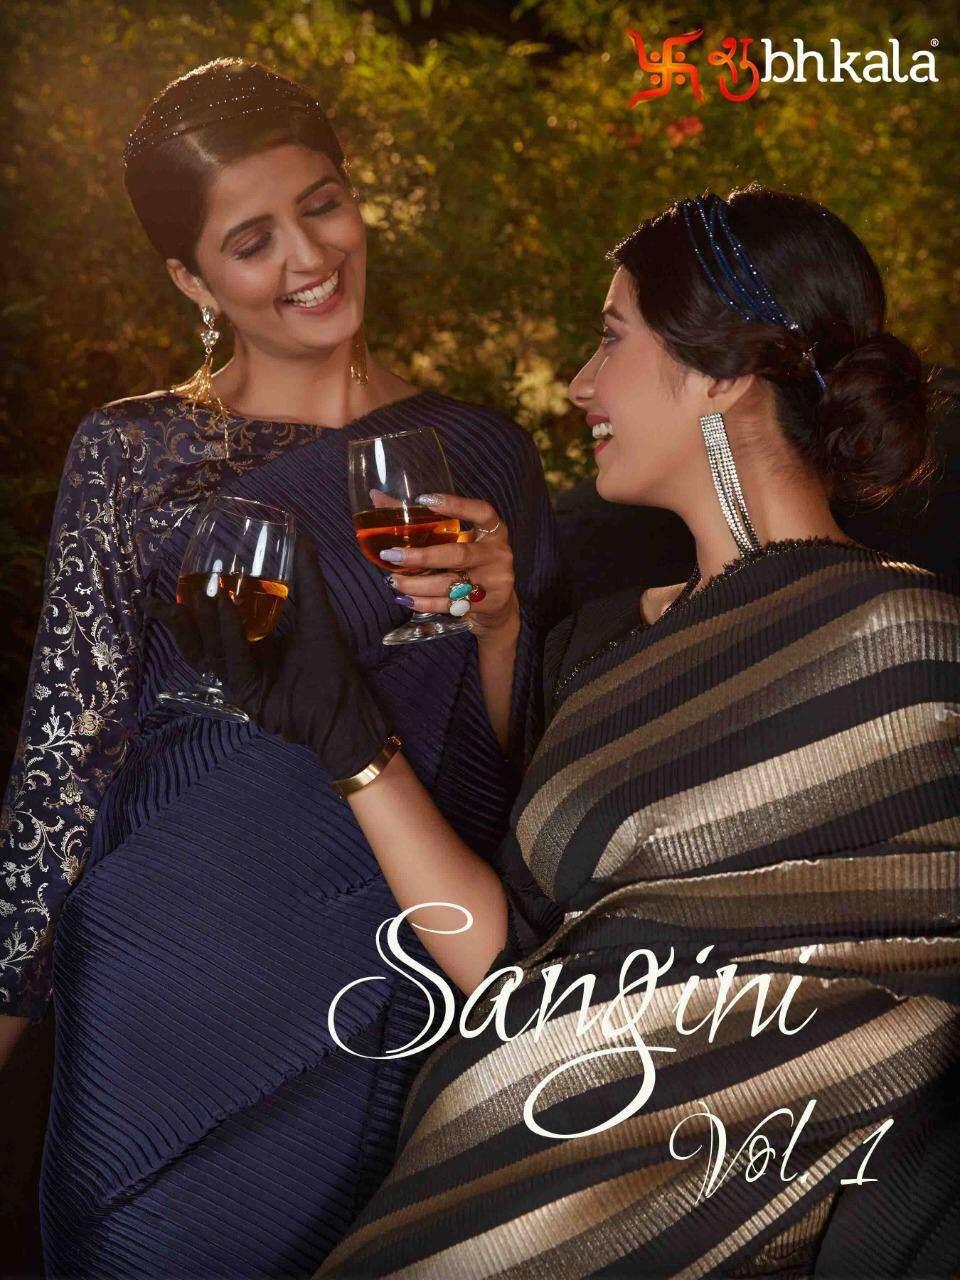 Shubh kala Sangini Vol 1 Designer Party Wear Silk Saree catalog Wholesale